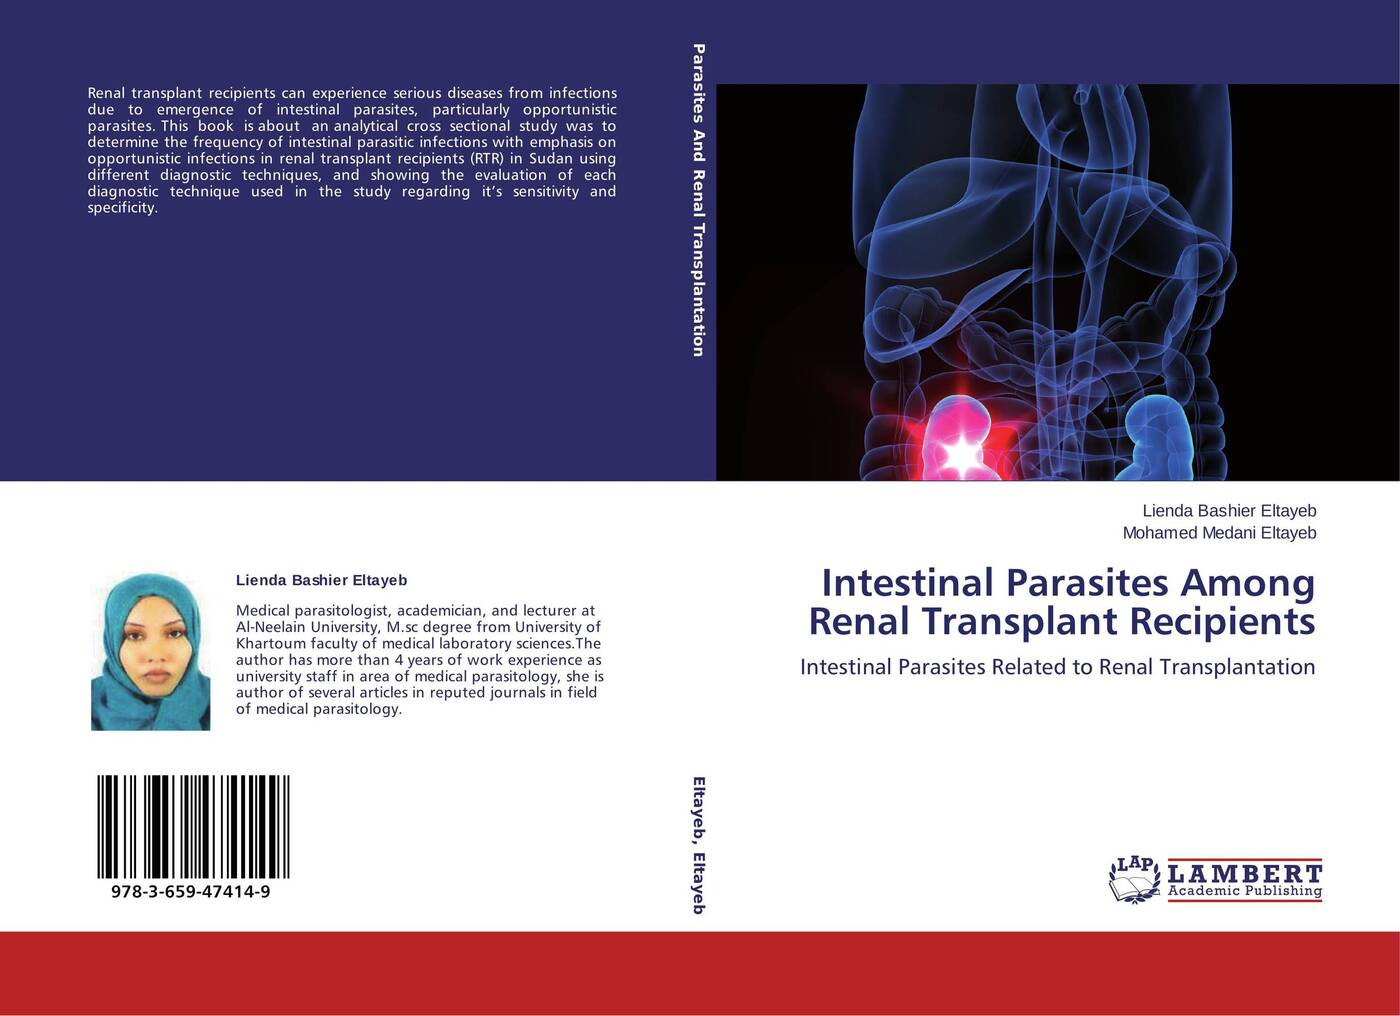 Lienda Bashier Eltayeb and Mohamed Medani Intestinal Parasites Among Renal Transplant Recipients